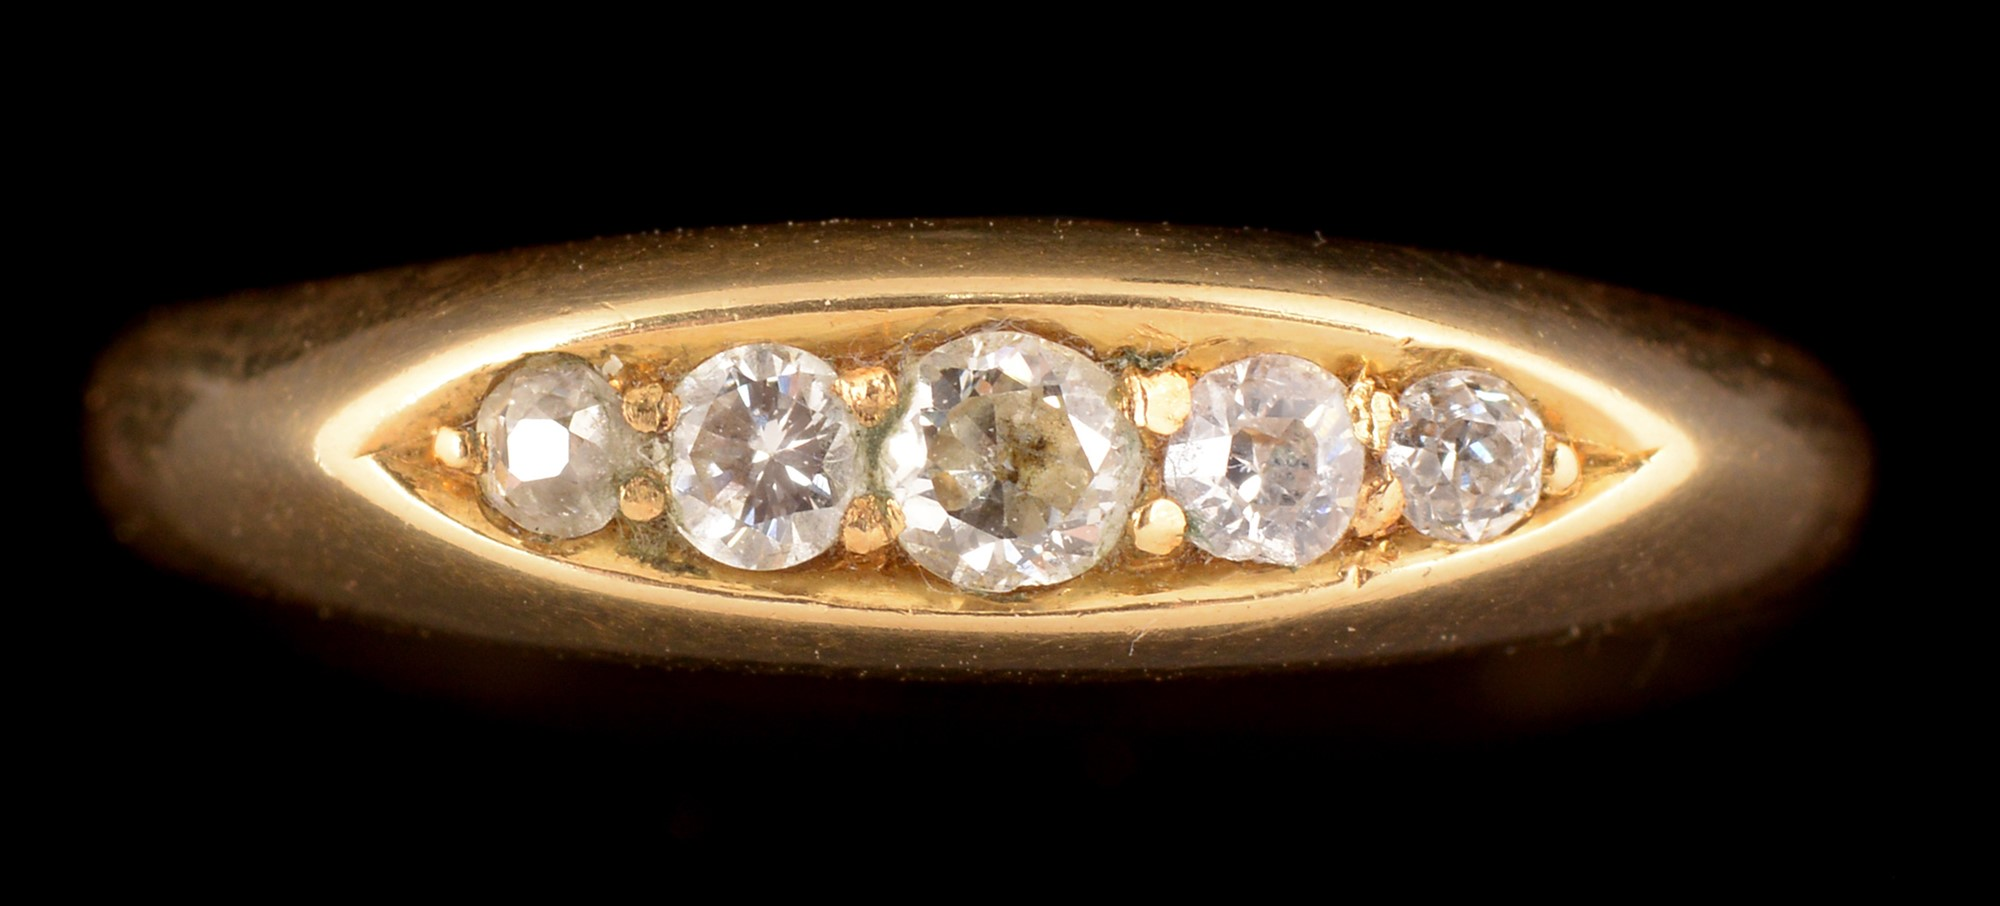 Lot 485 - A diamond ring